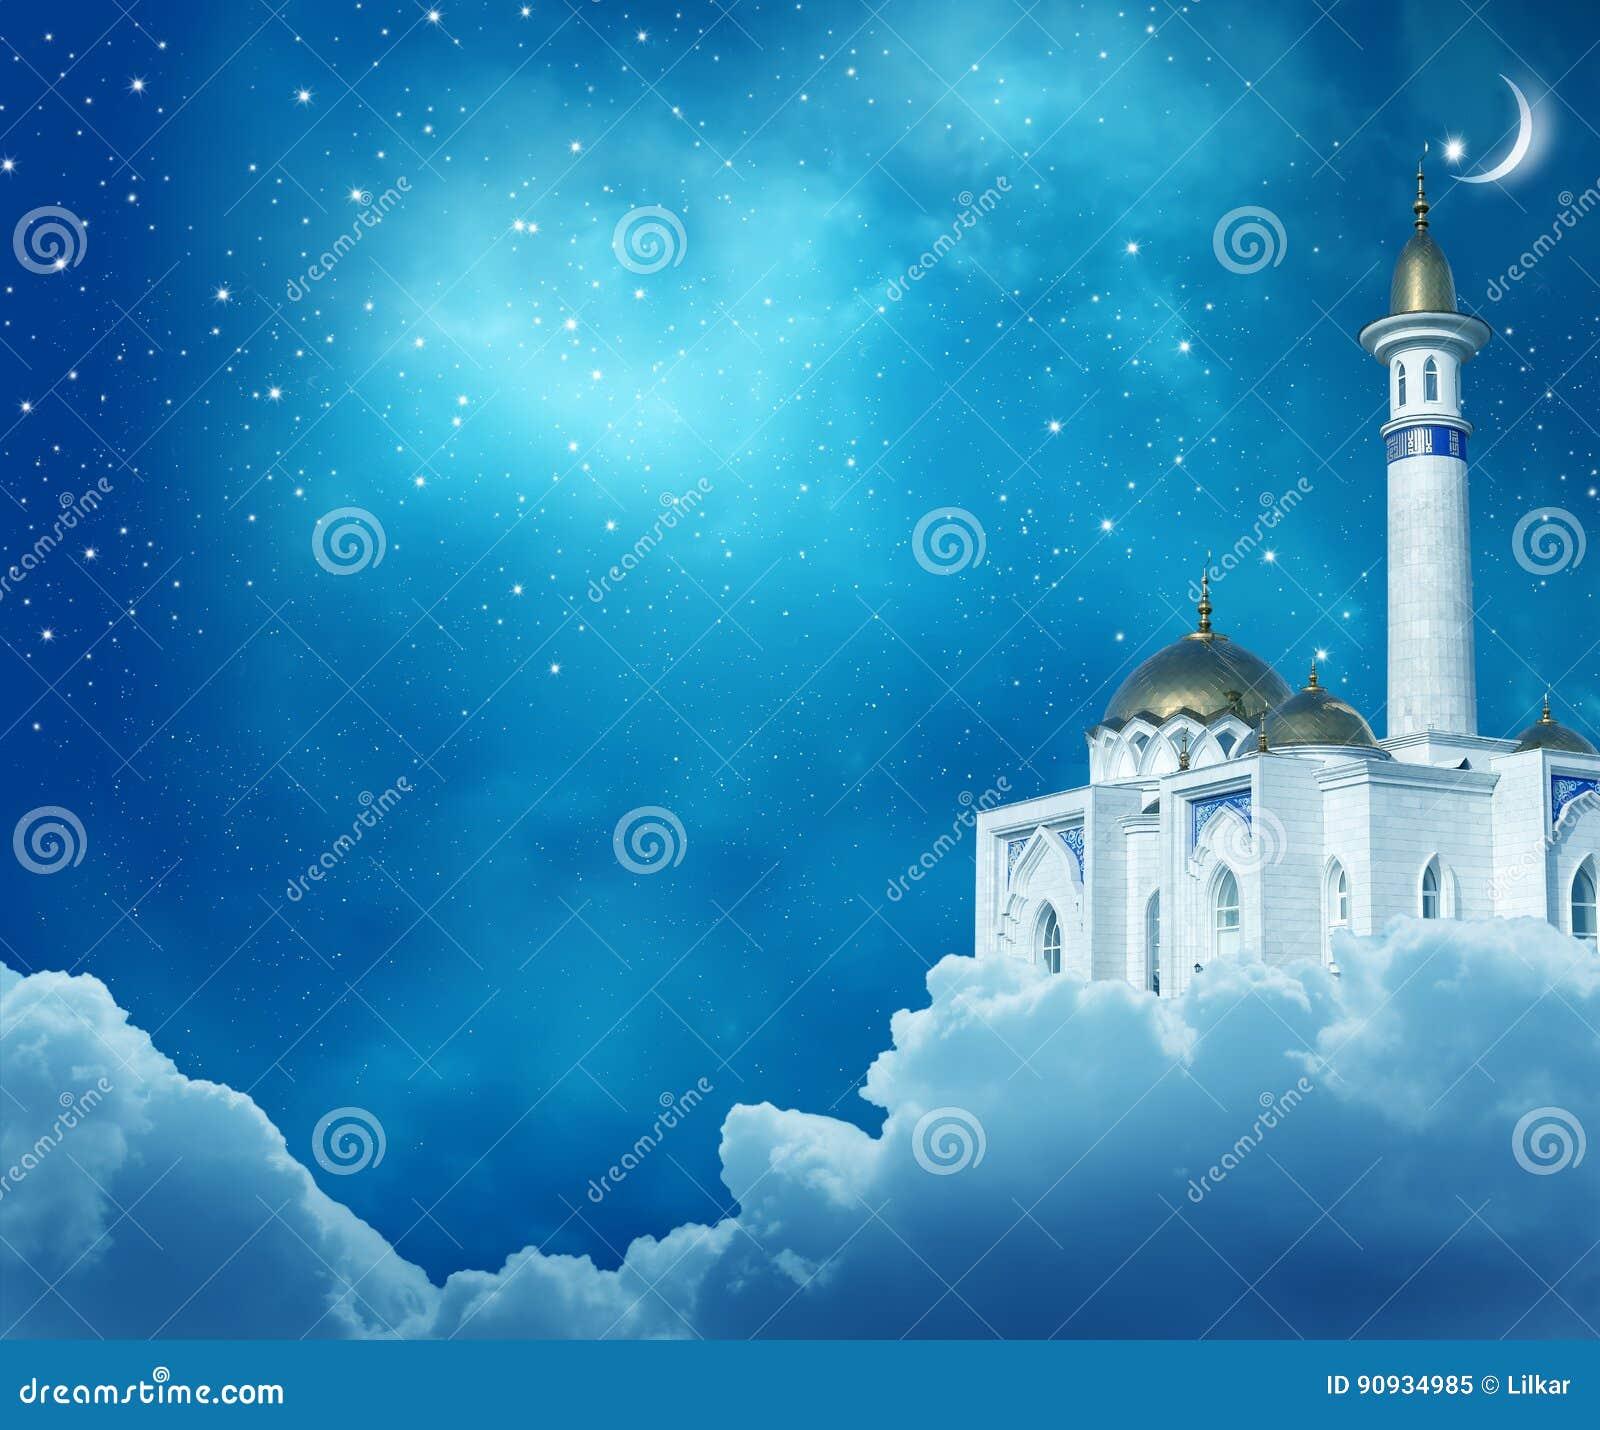 Mosque background for ramadan kareem stock photography image - Ramadan Kareem Background Stock Photo